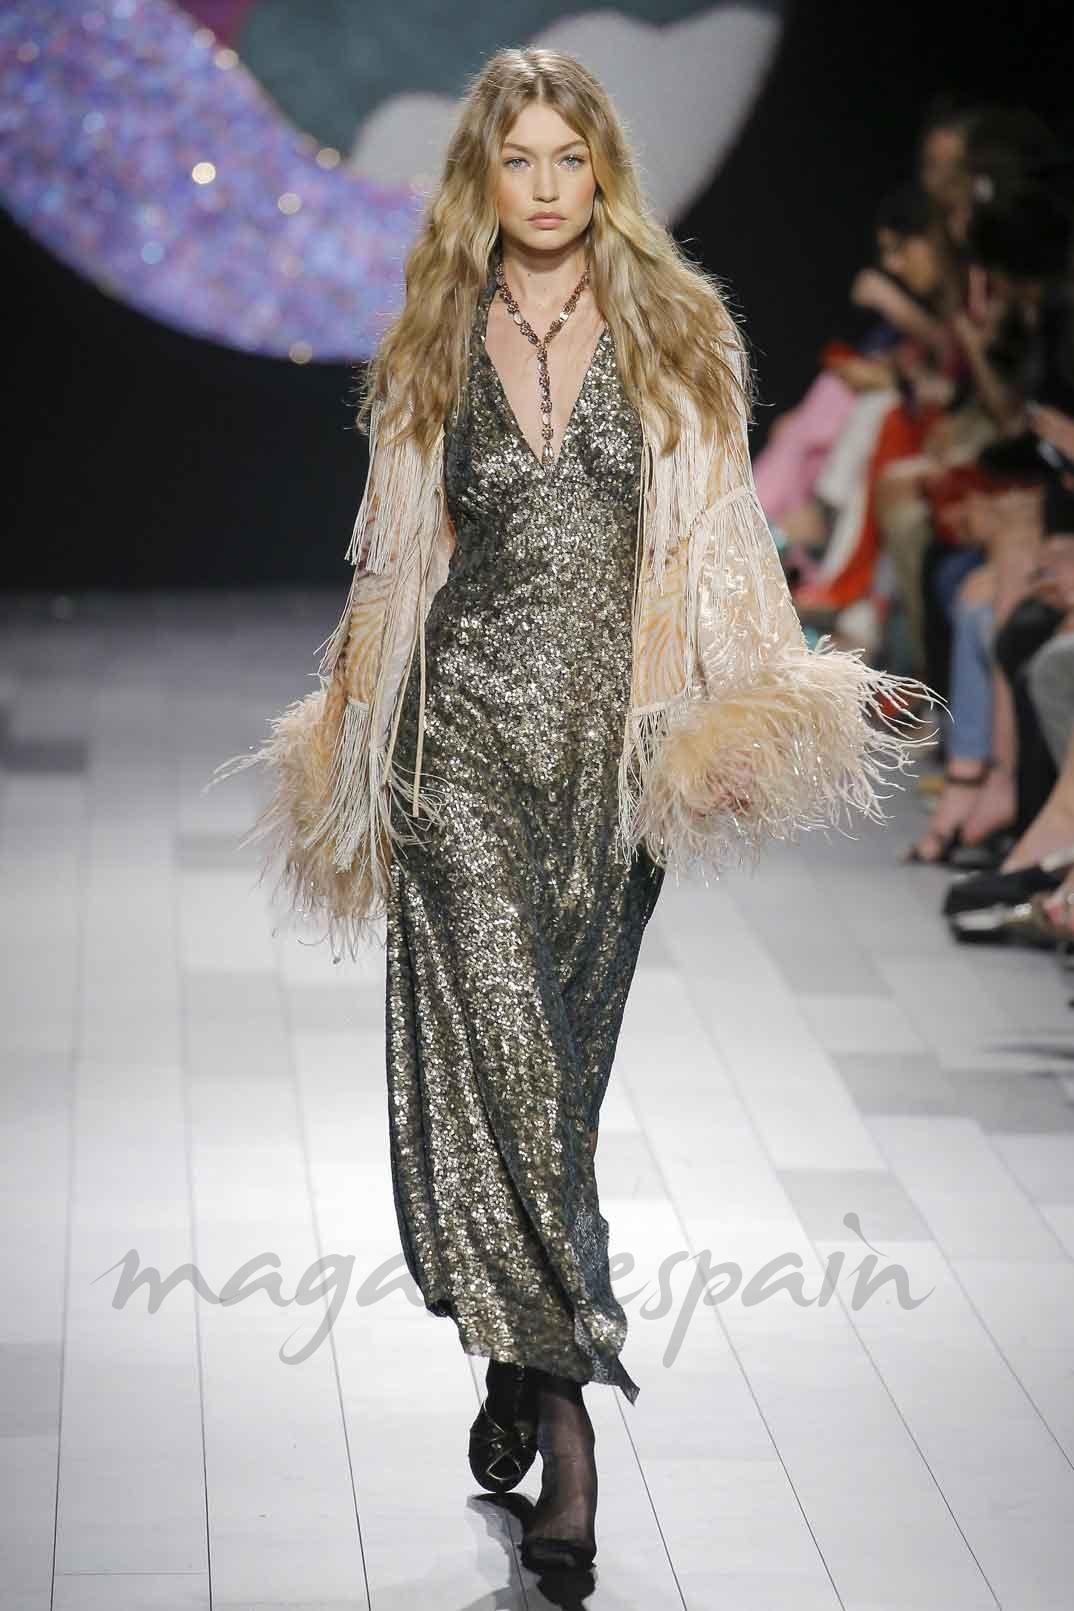 Gigi Hadid - NYFW SS10 - Anna Sui